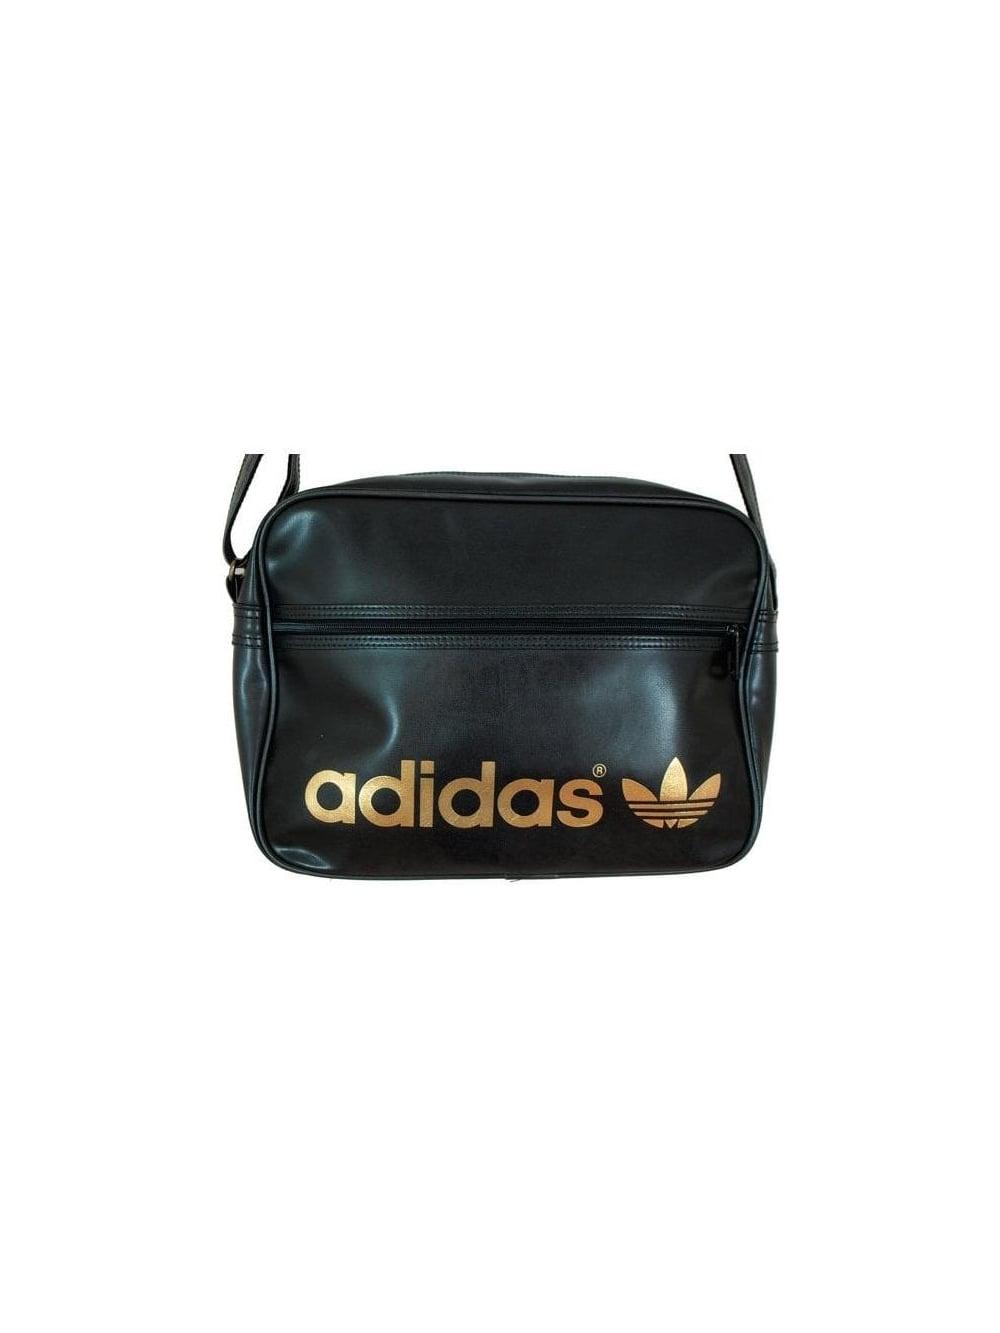 Adidas Originals AC Airline Bag in Black Metal - Shop Adidas ... 54147b707c658